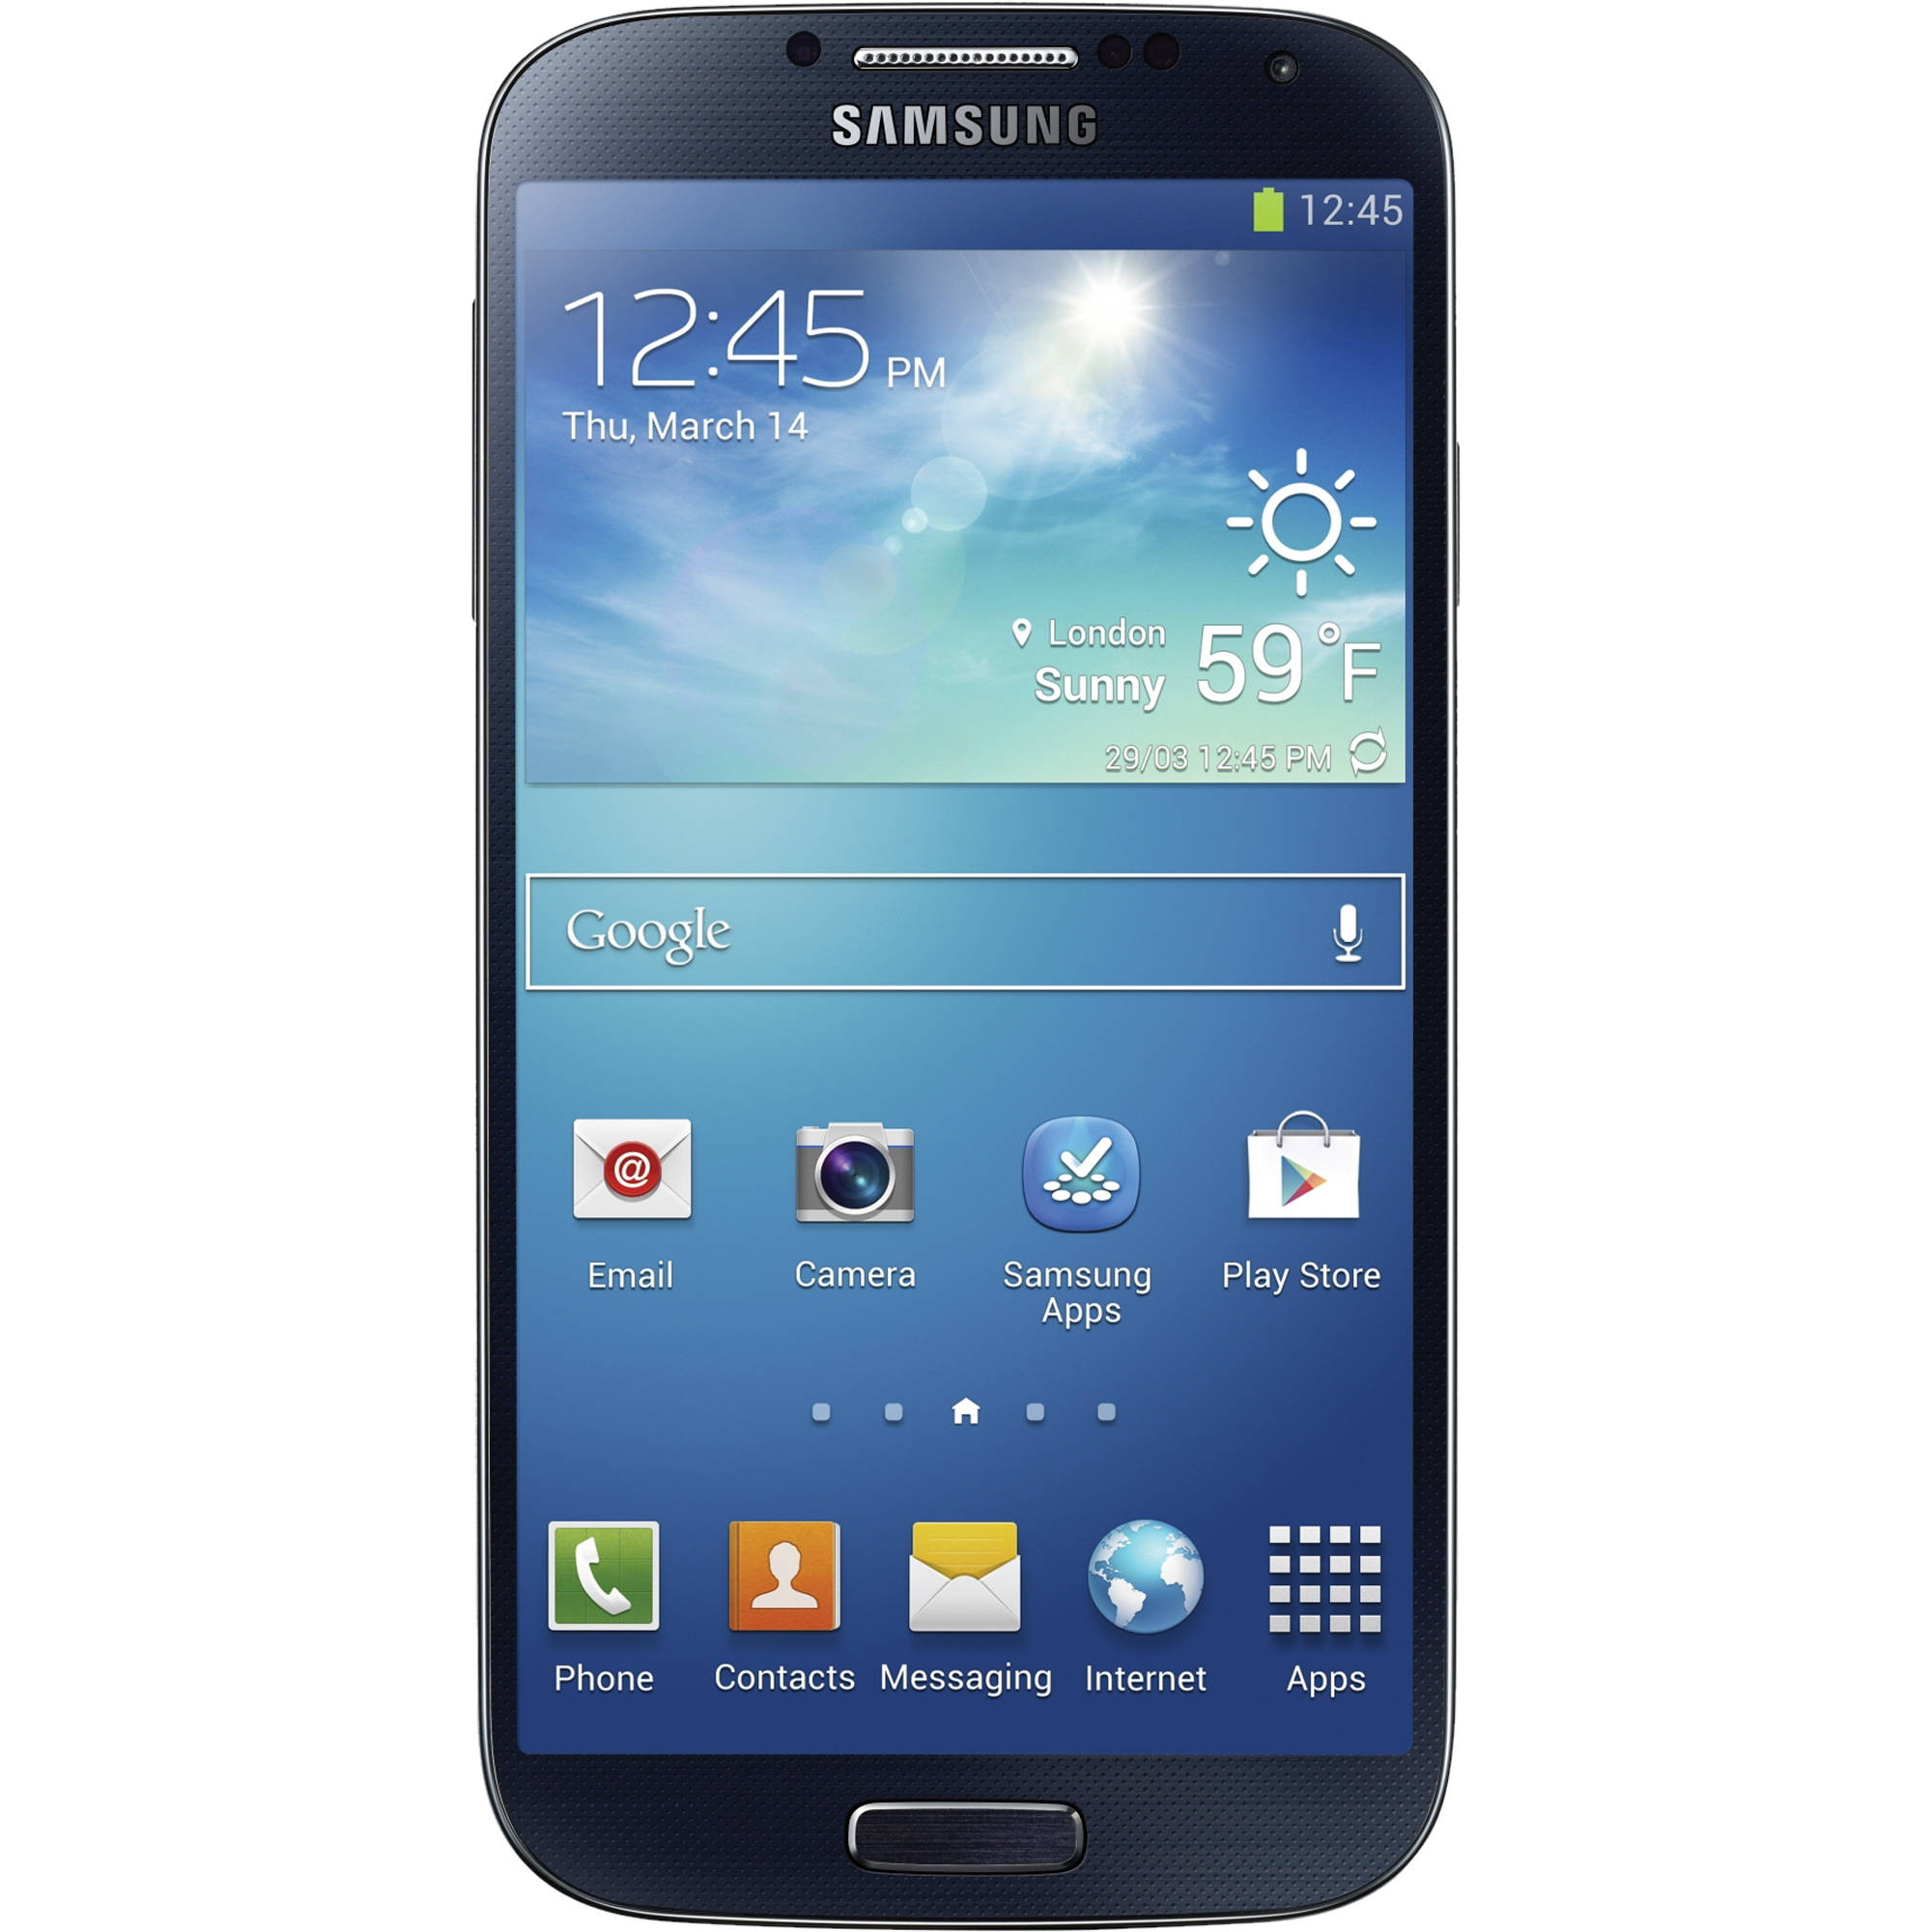 Samsung Galaxy S4 Gt I9500 16gb Smartphone I9500 Black B Amp H